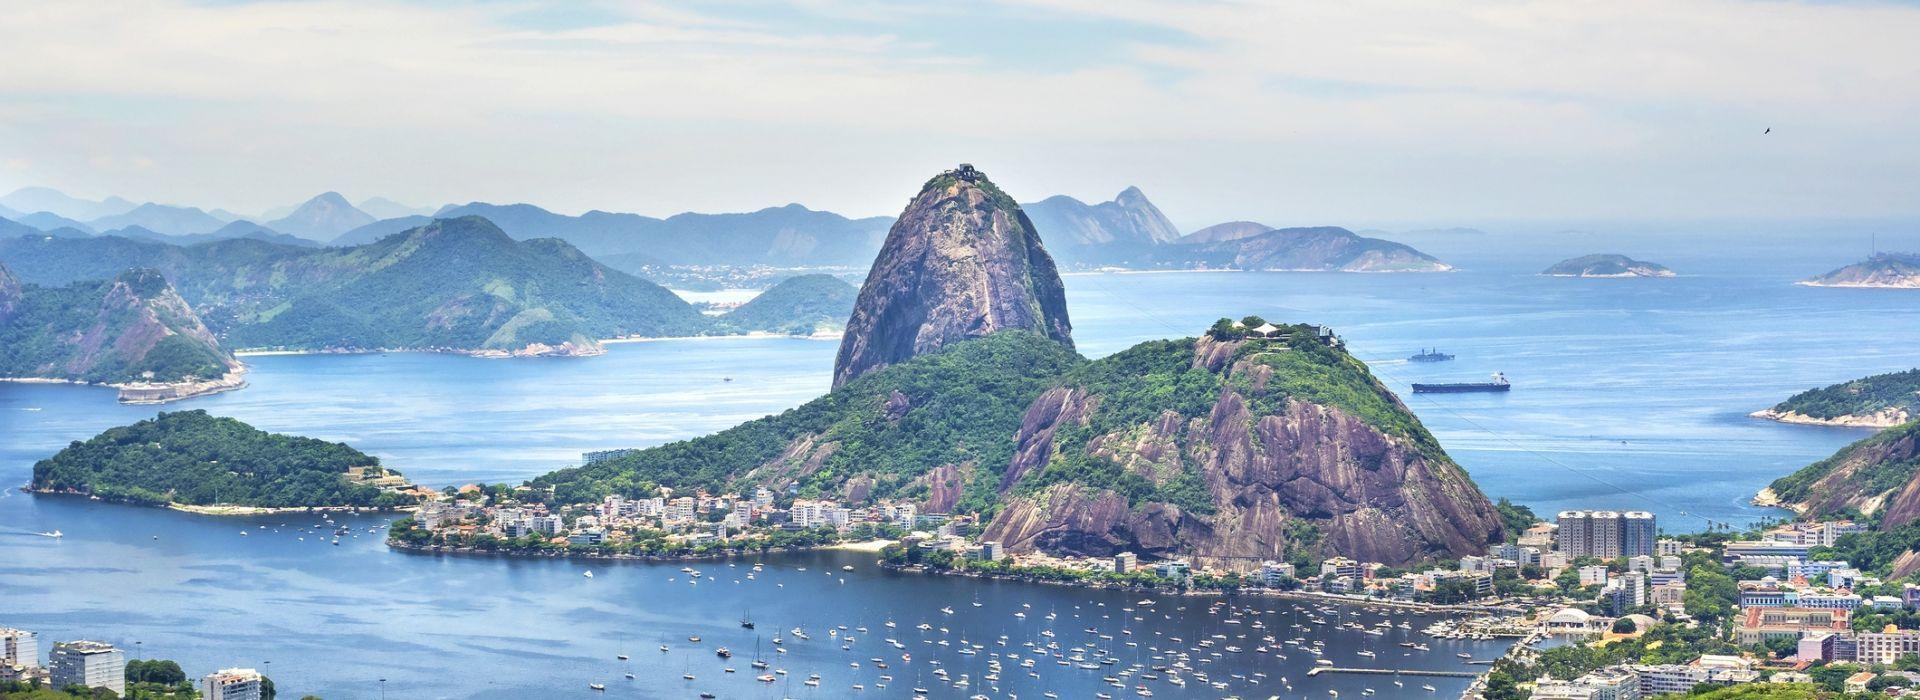 City sightseeing Tours in Rio de Janeiro